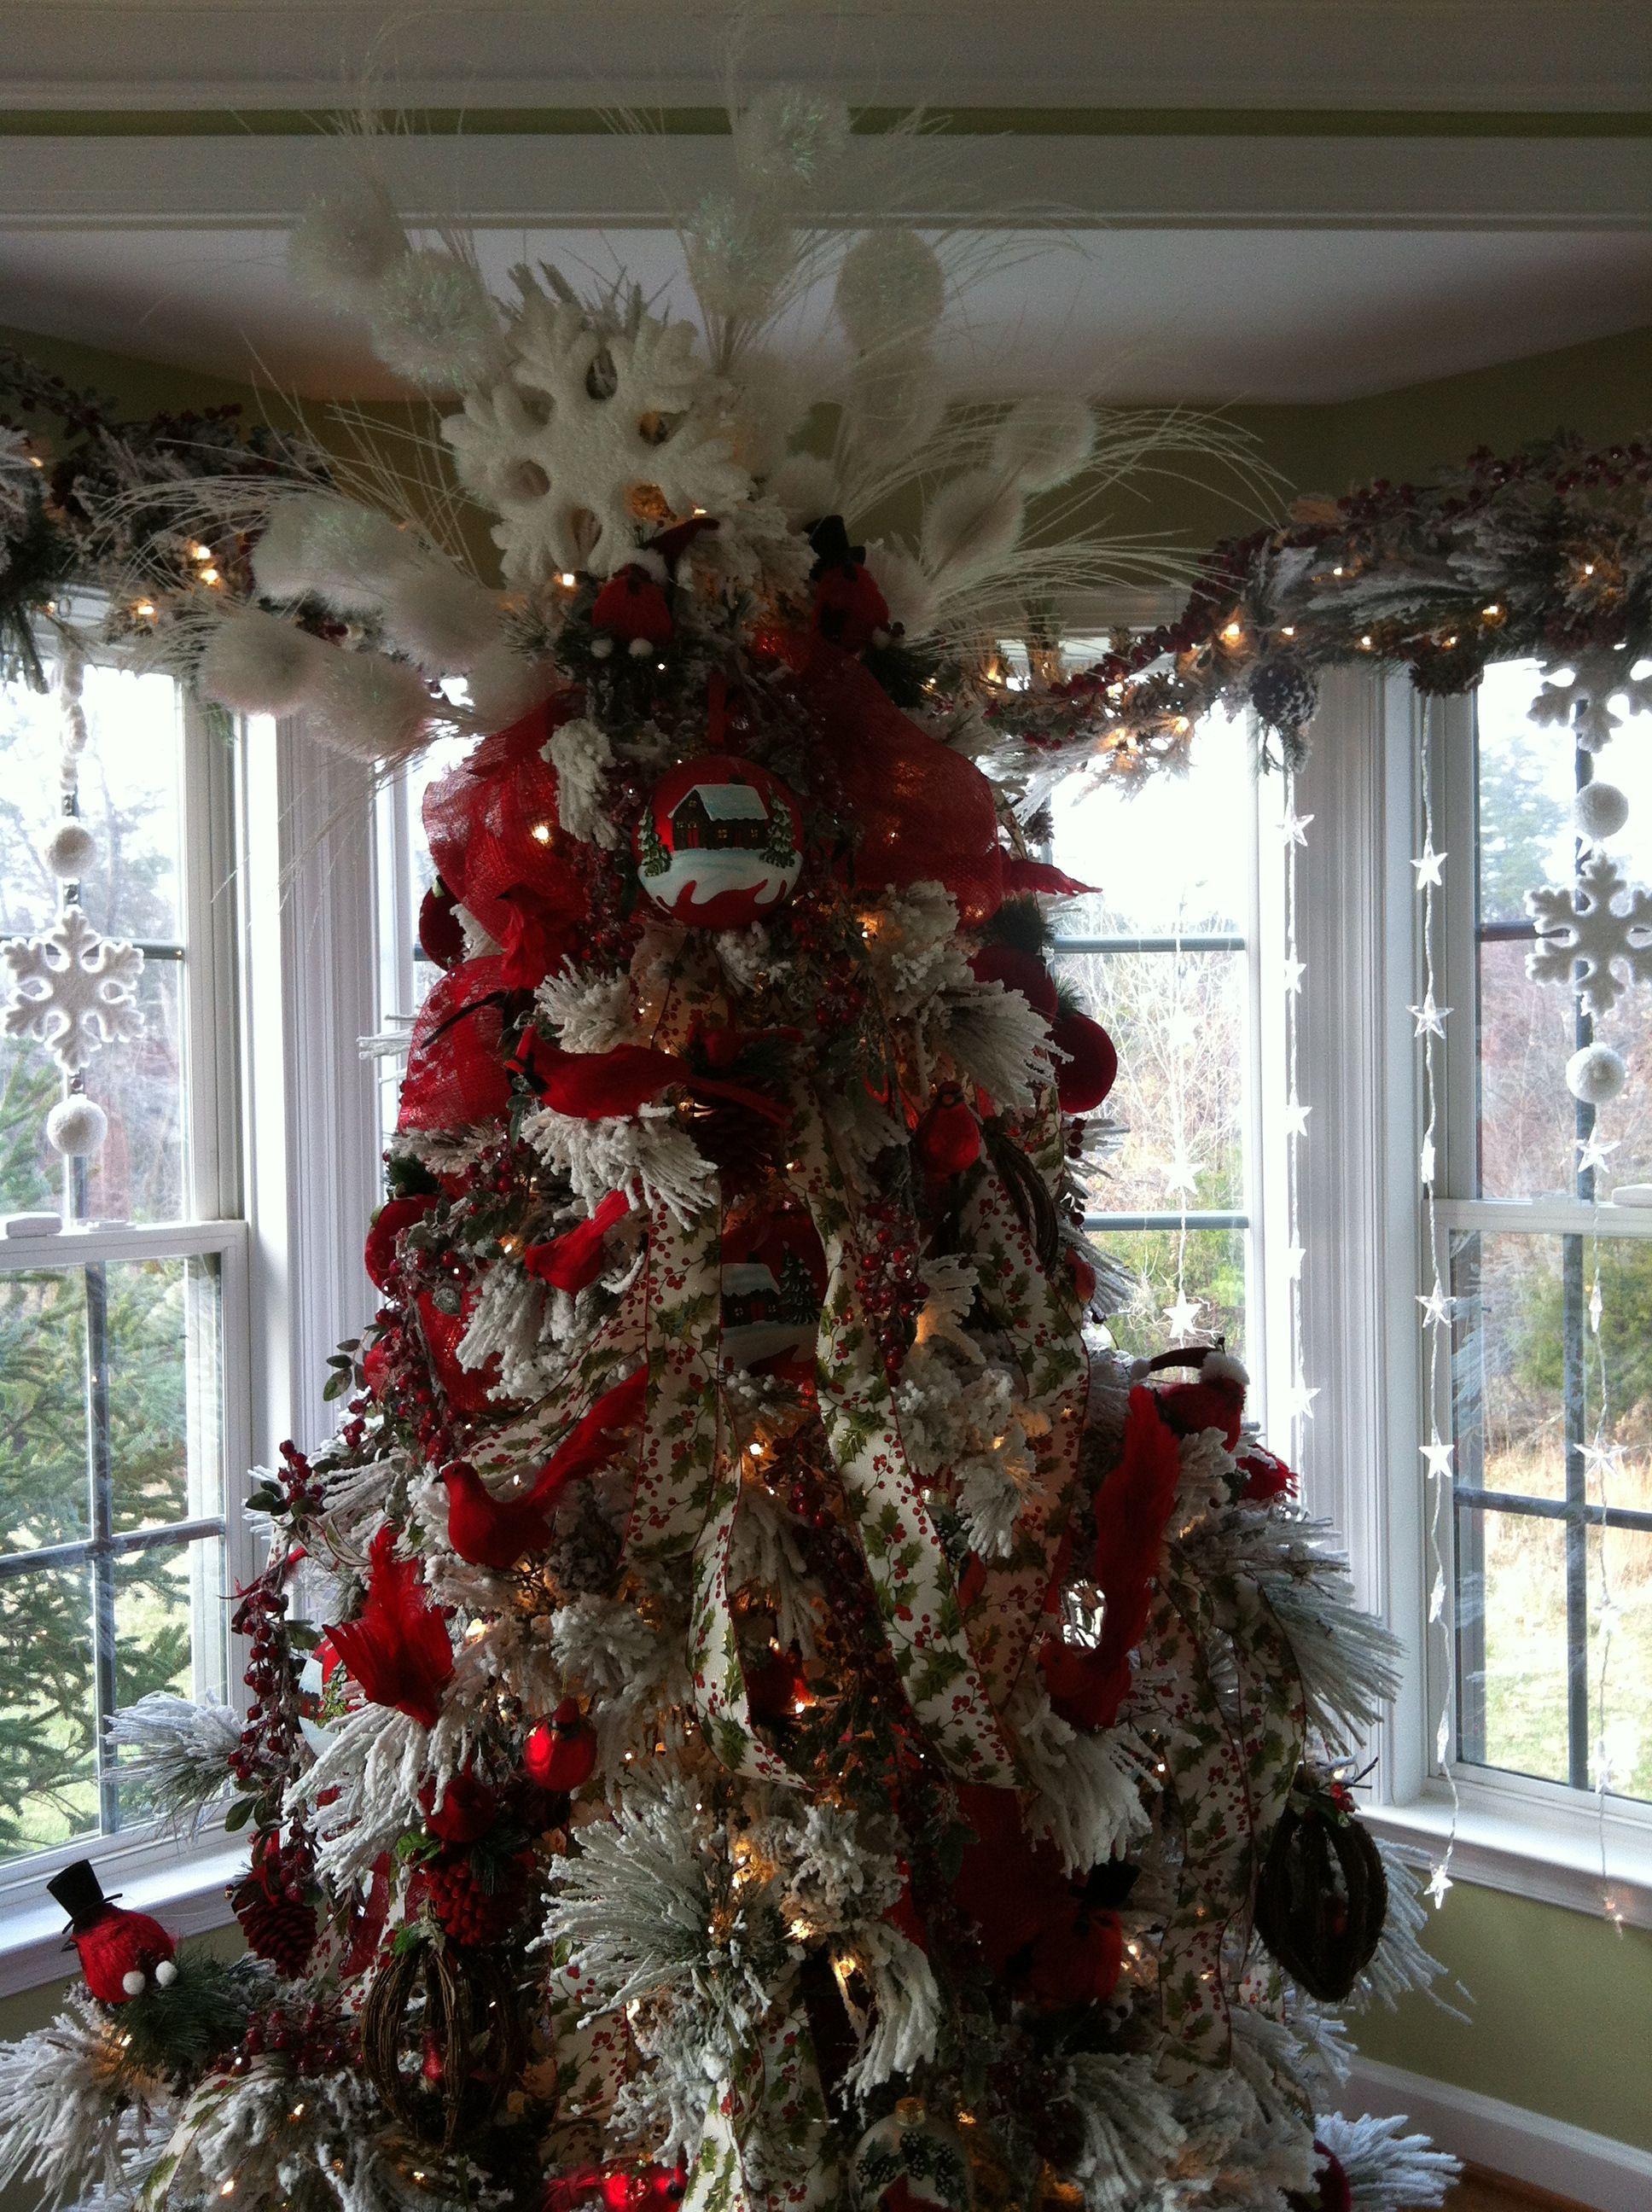 flocked christmas tree decorated christmas trees. Black Bedroom Furniture Sets. Home Design Ideas